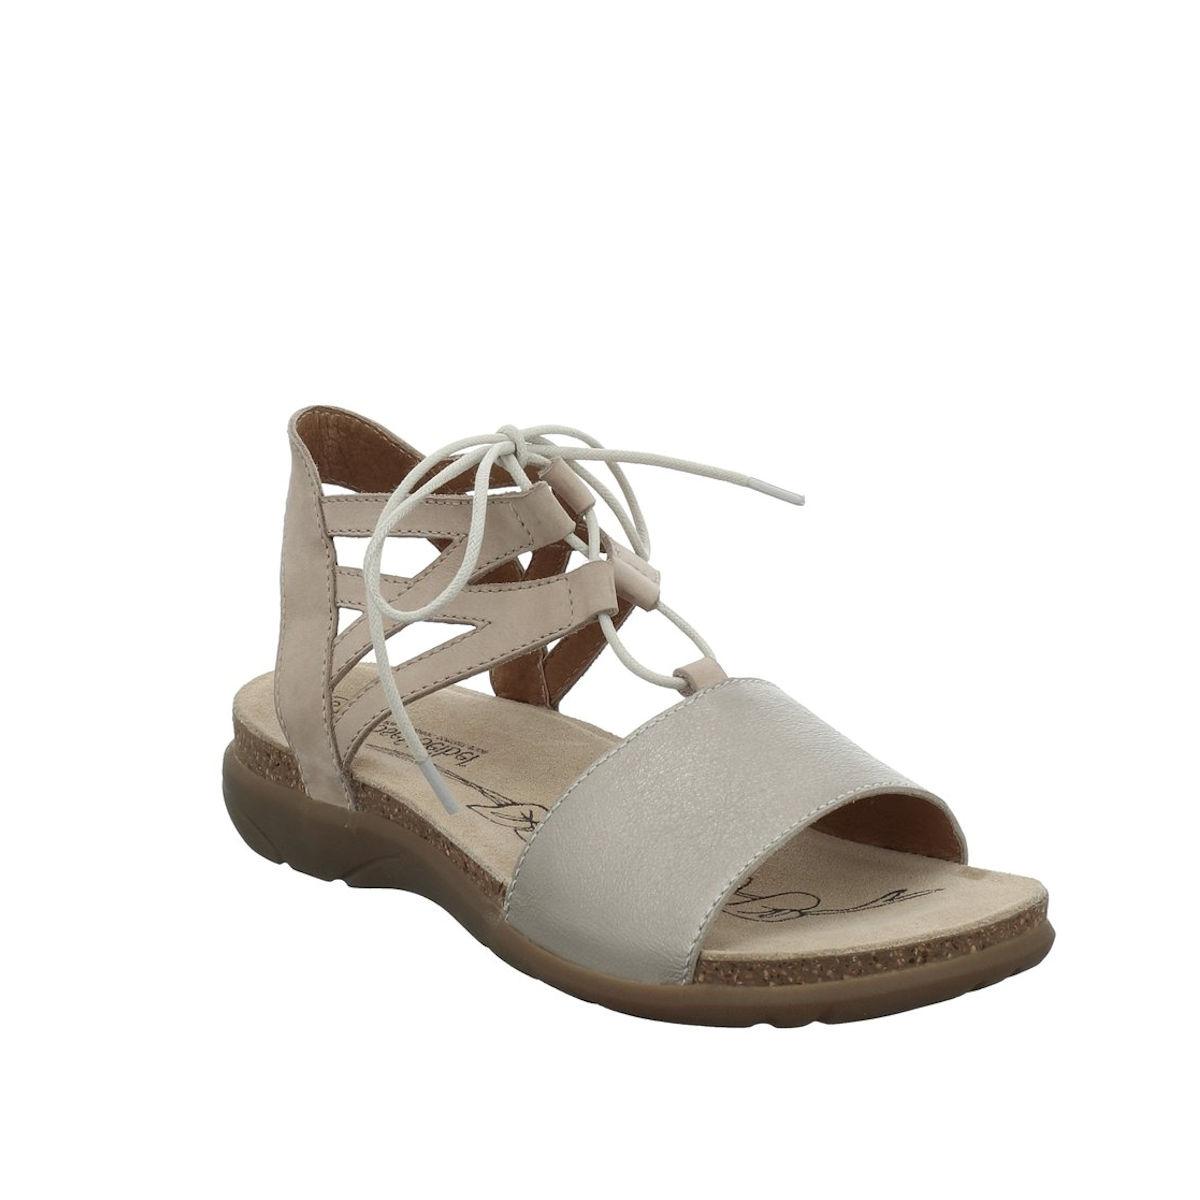 Josef Seibel Riley 06 - Womens Beige Leather Gladiator Style Sandal